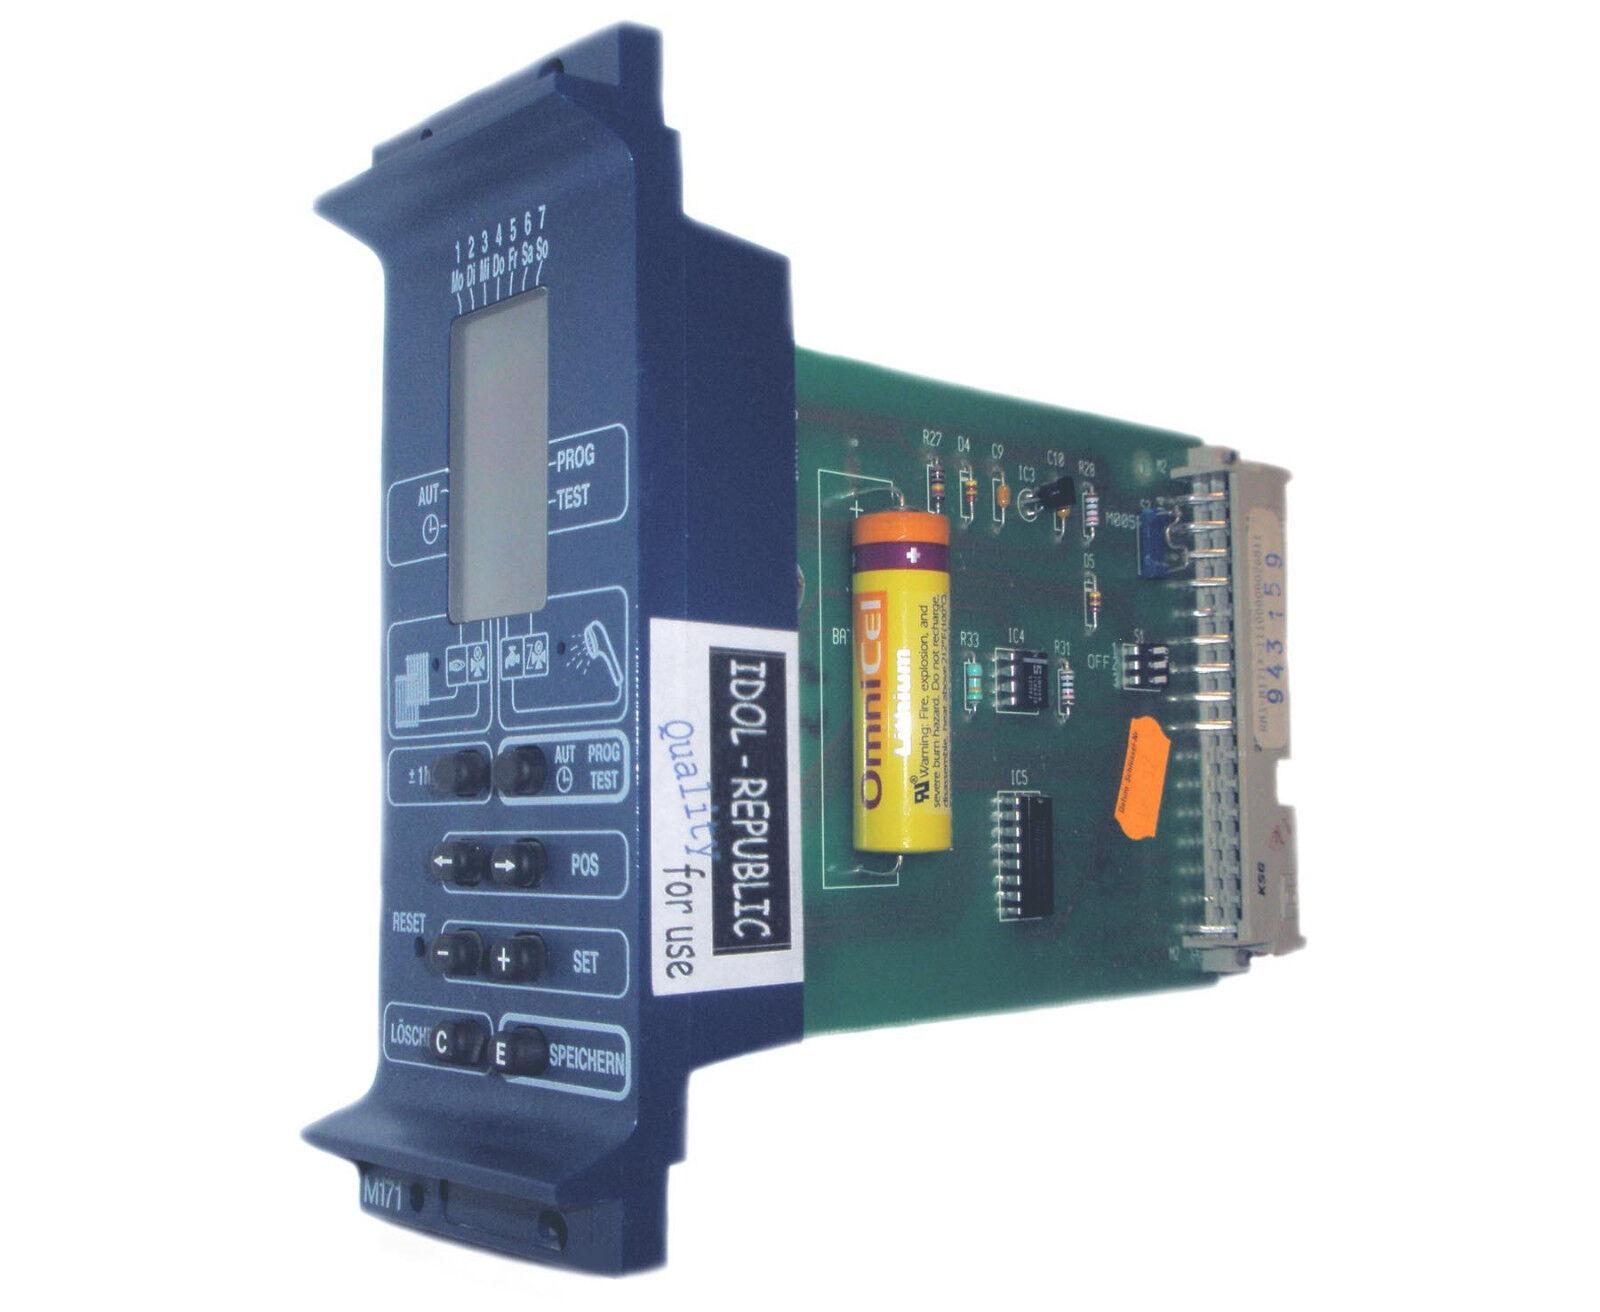 Buderus Modul M171 Digital Schaltuhr M 171 Digitalschaltuhr Digitalschaltuhr Digitalschaltuhr - M071 Ecomatic 3000 85fb35